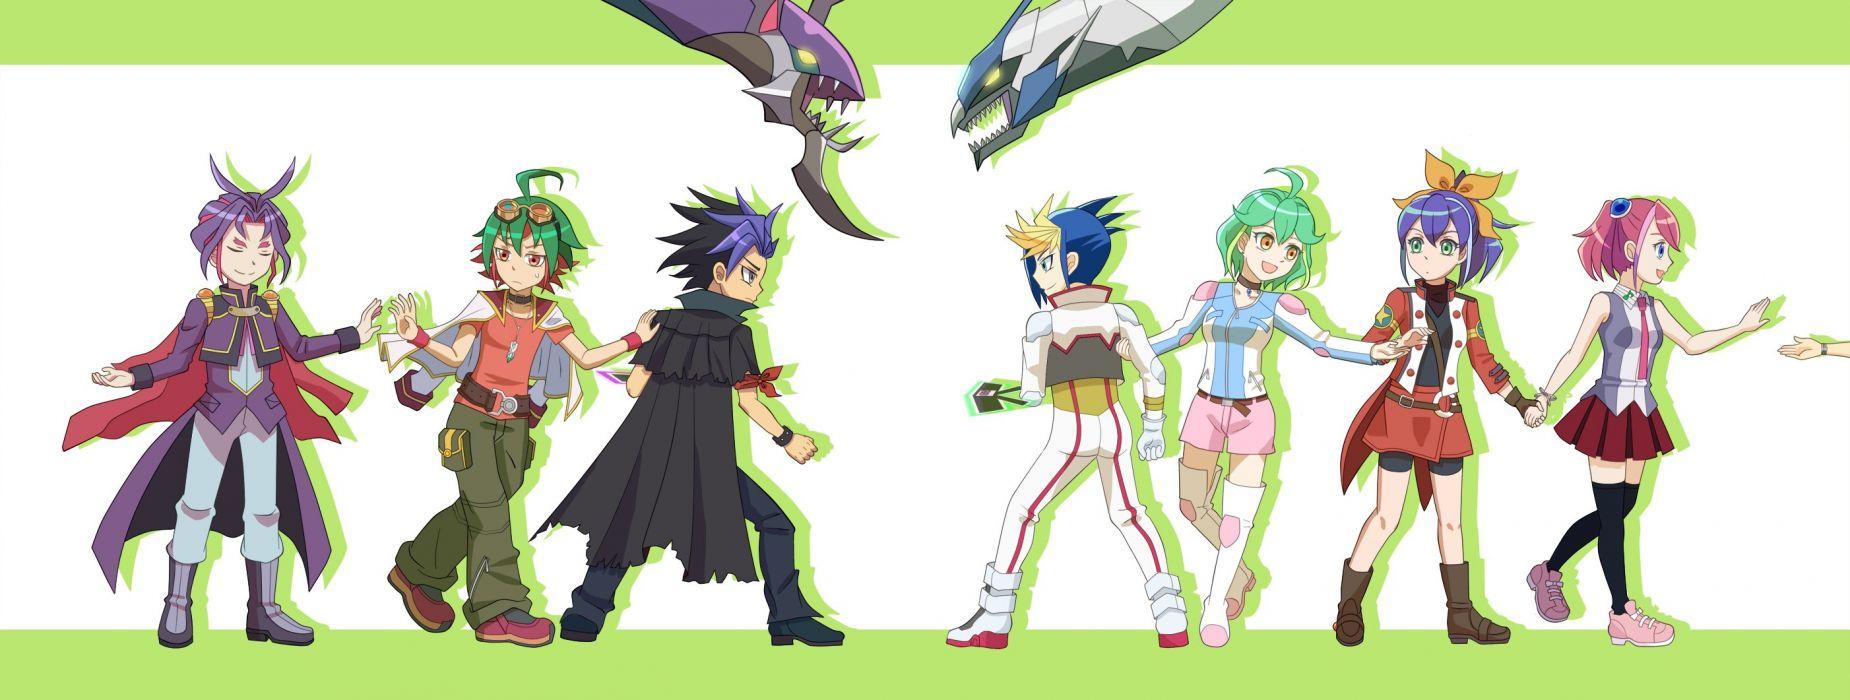 Yu-Gi-Oh! ARC-V Hiiragi Yuzu Clear Wing Synchro Dragon Sakaki Yuya wallpaper